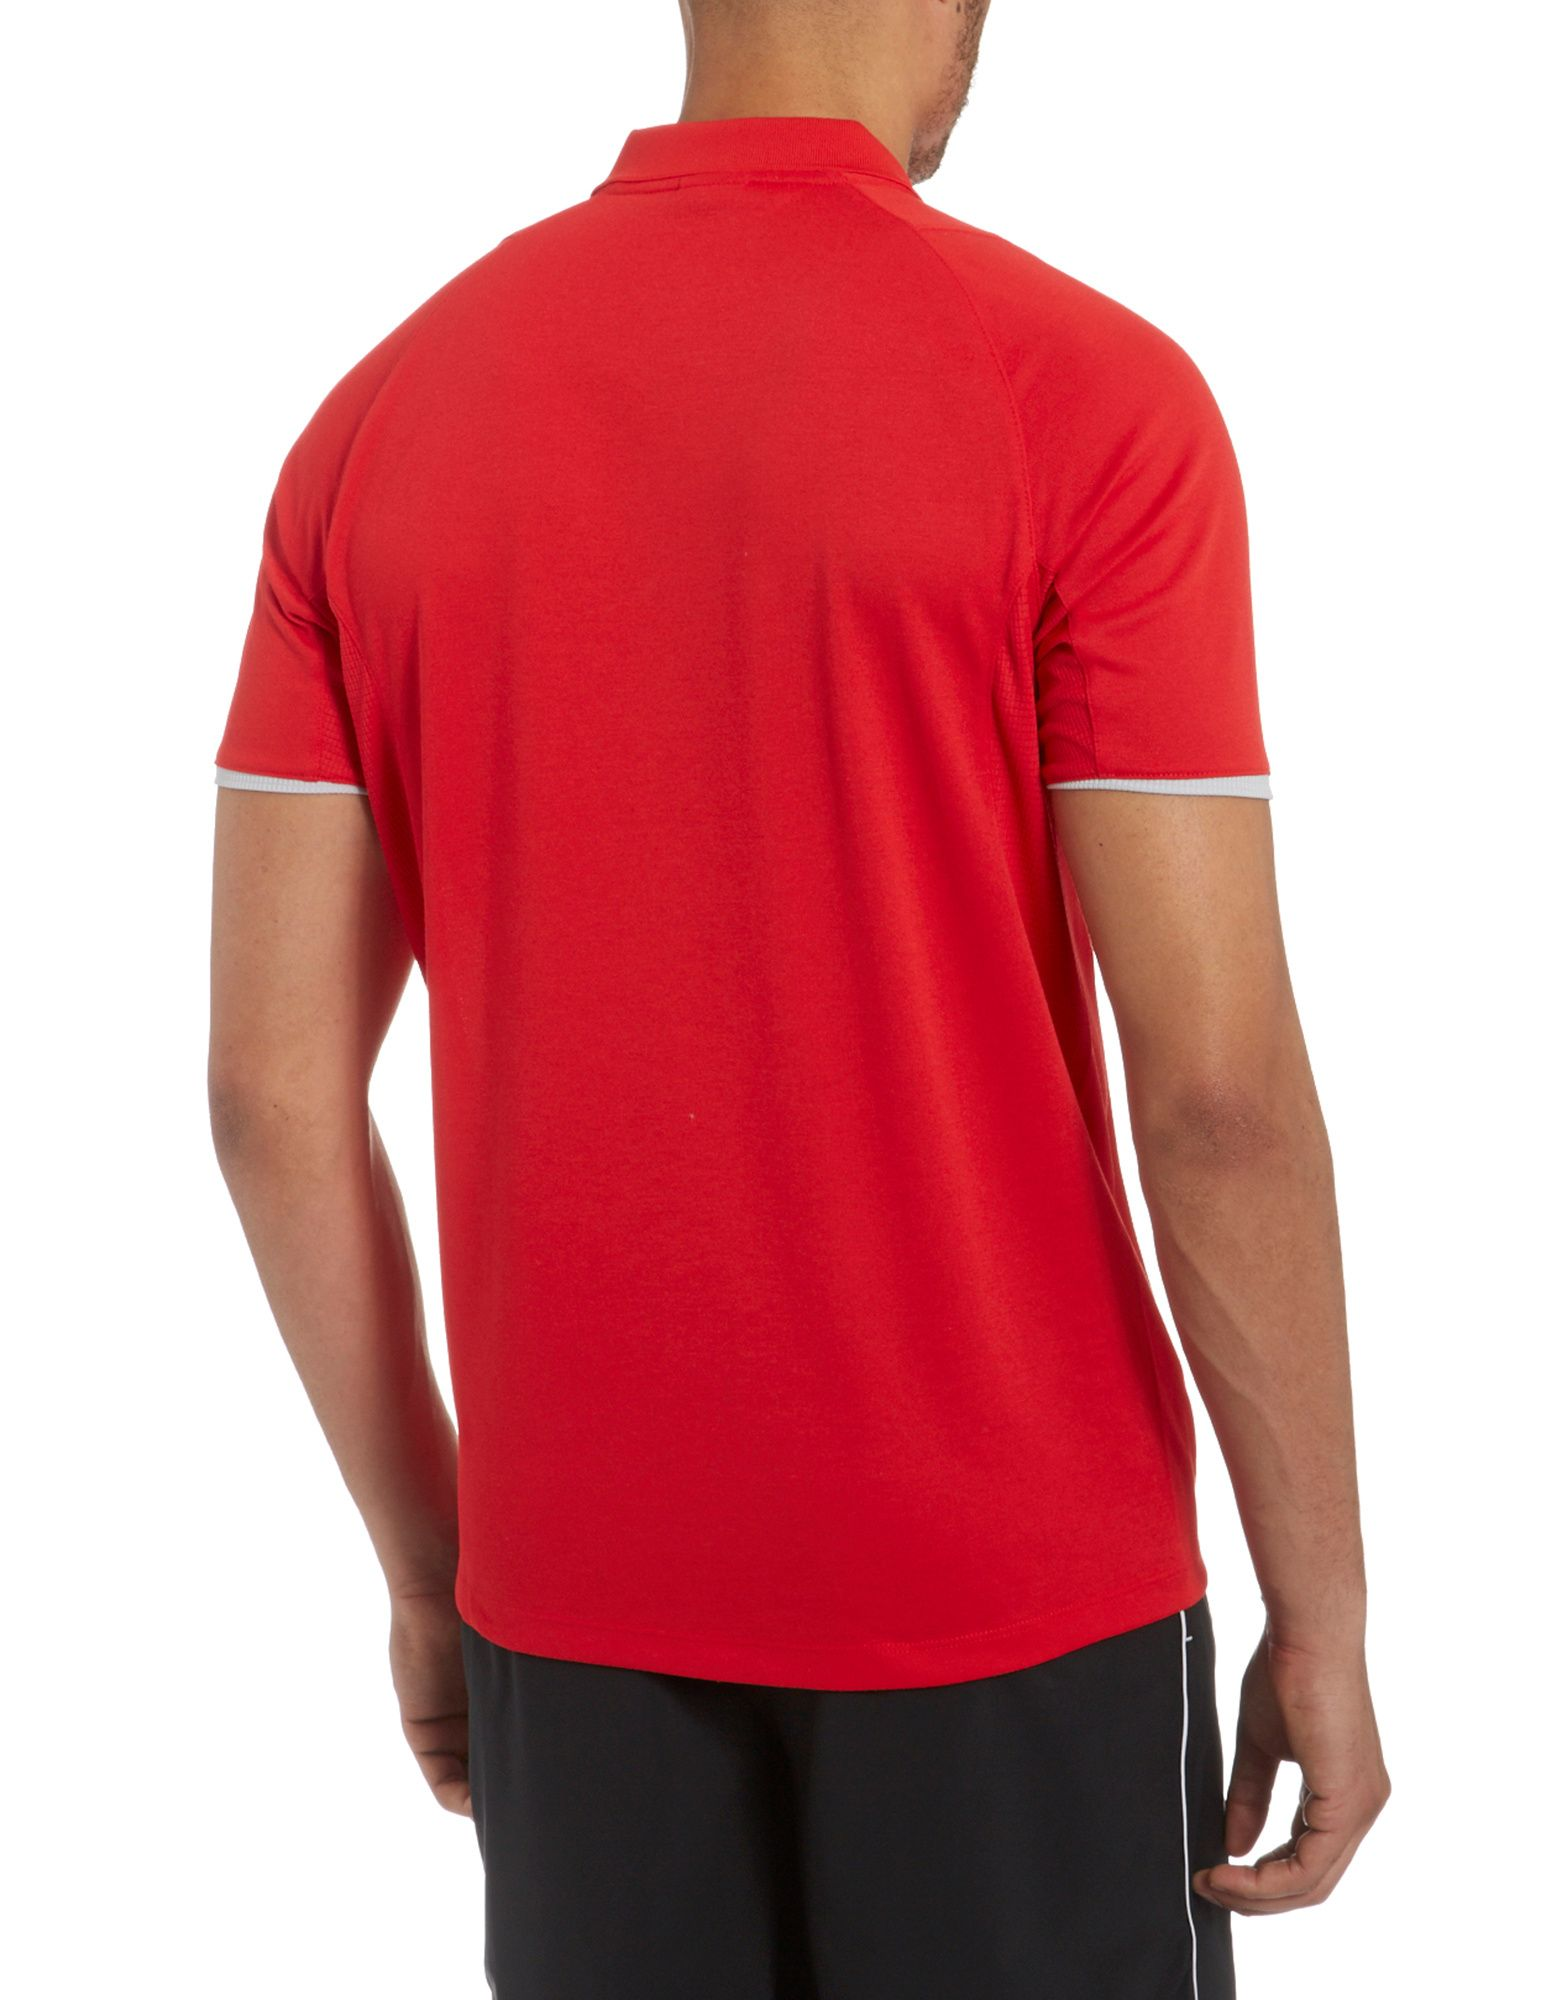 Warrior Sports Liverpool FC Polo Shirt